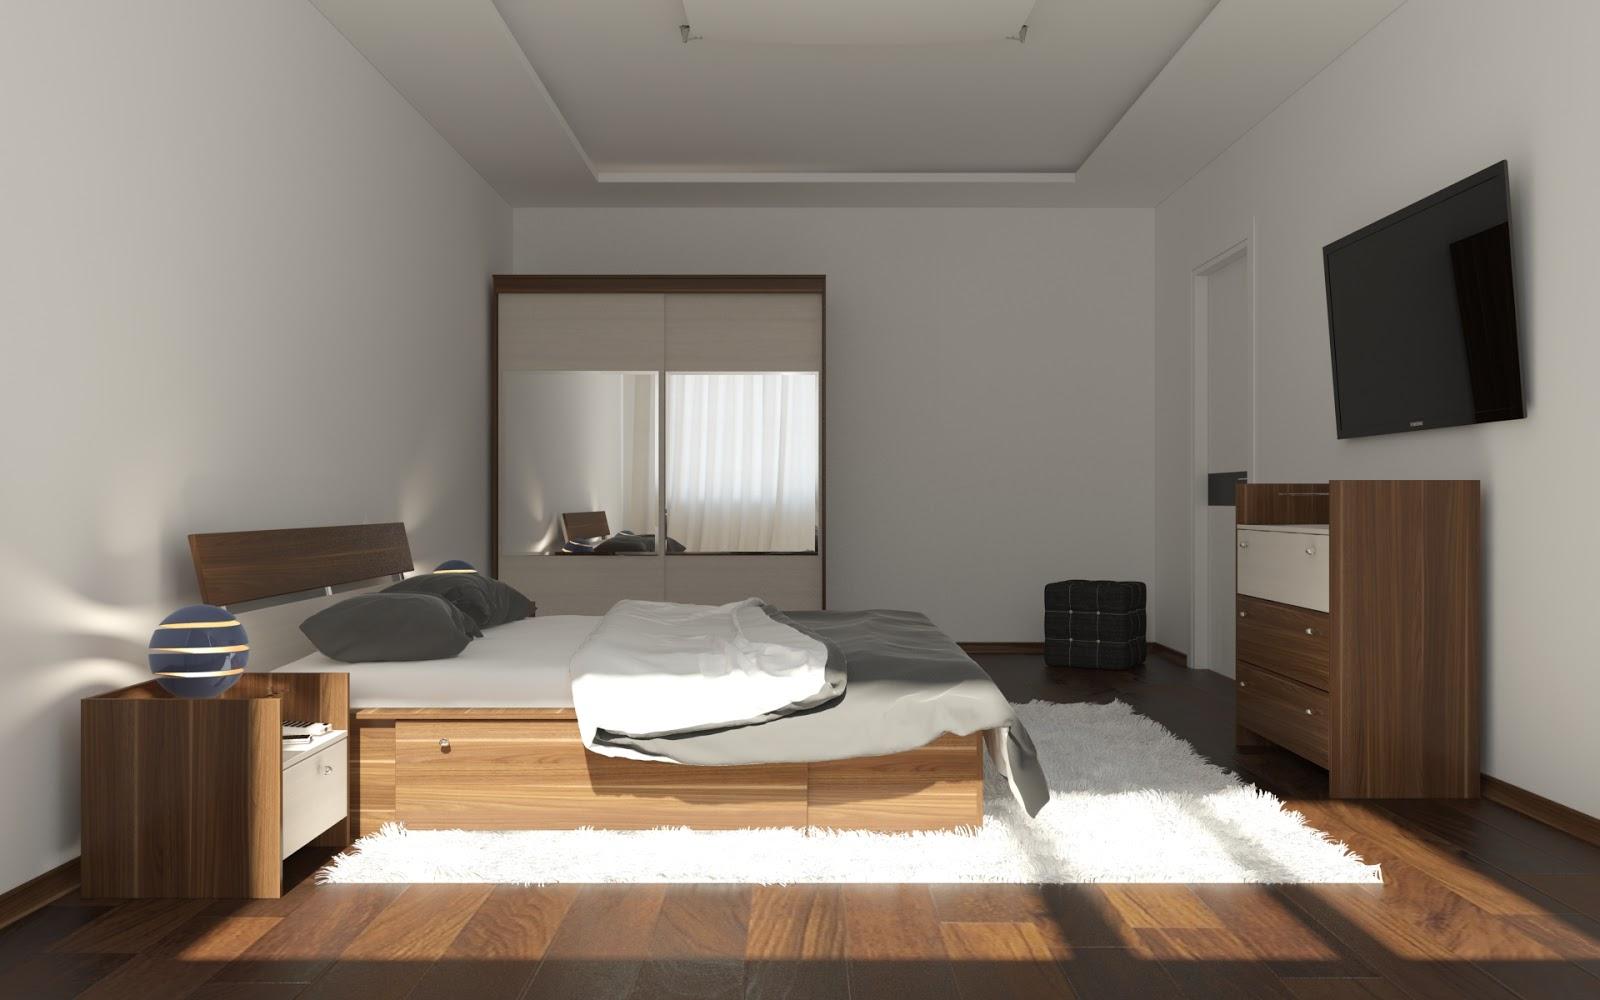 design ideas warehouse bedroom photo gallery